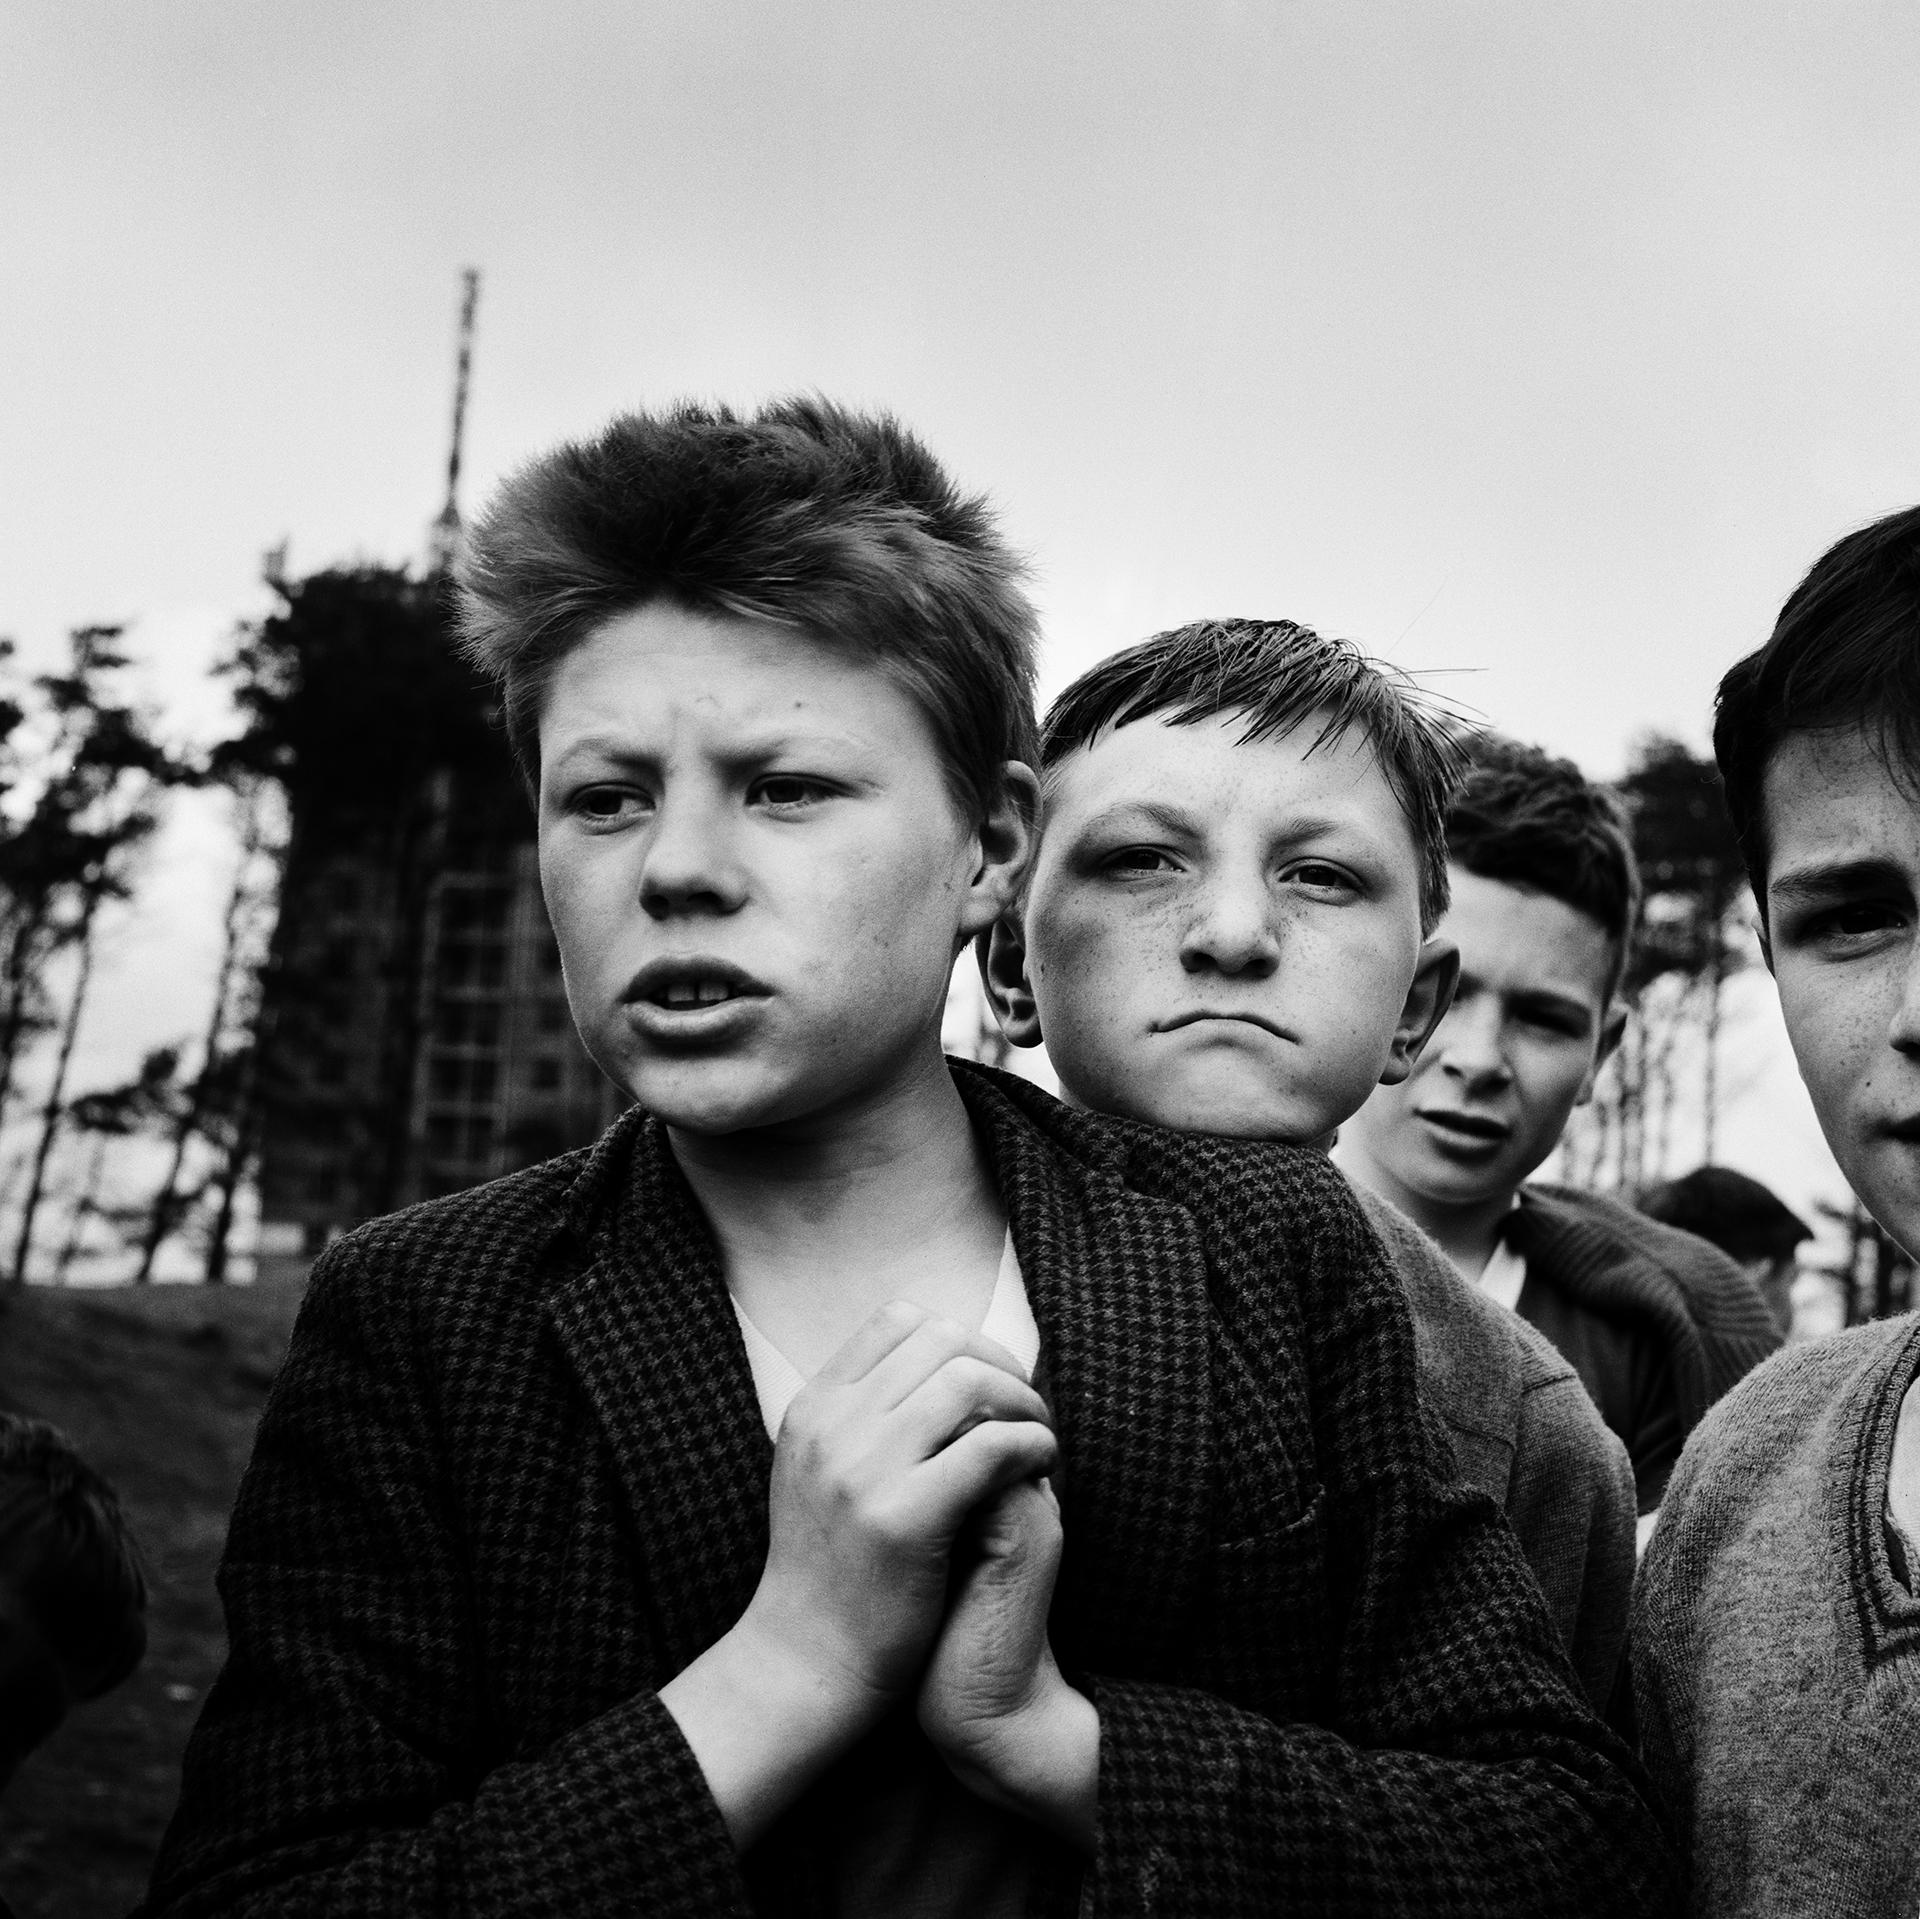 Image of The Castlemilk Lads (1963) by Oscar Marzaroli